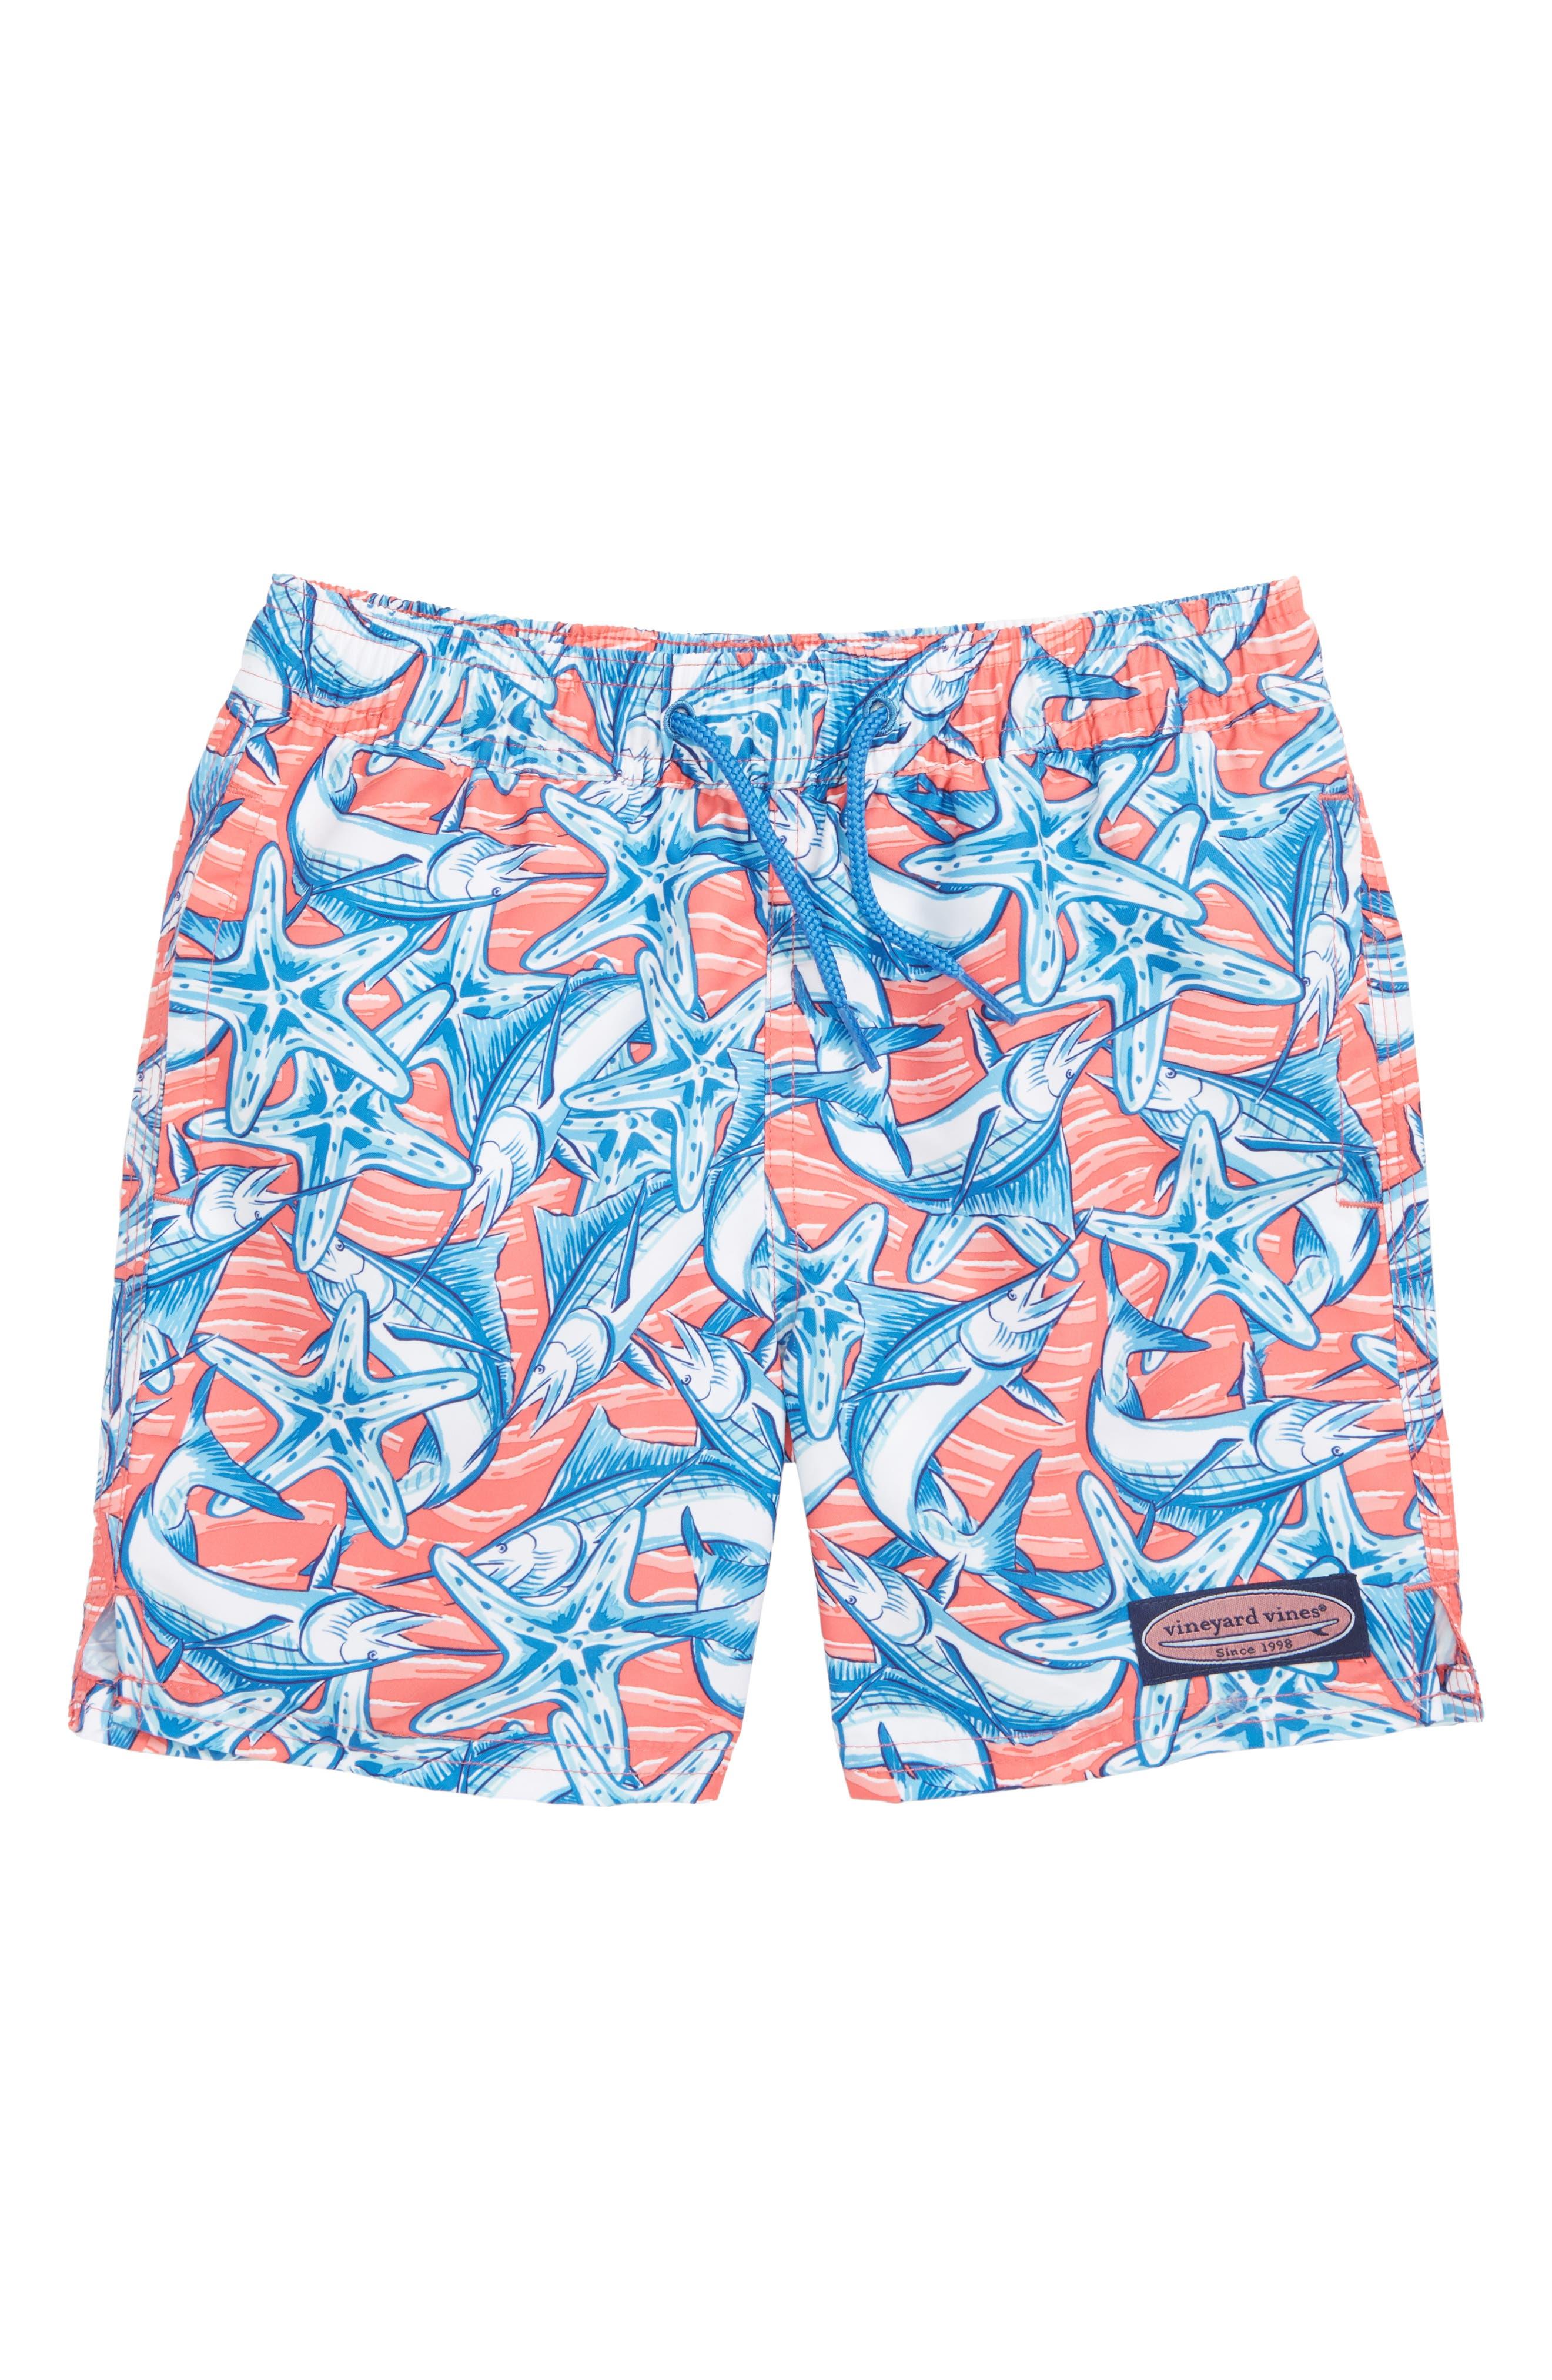 4fae842737d2a Boys  Vineyard Vines Surf   Swim Clothing